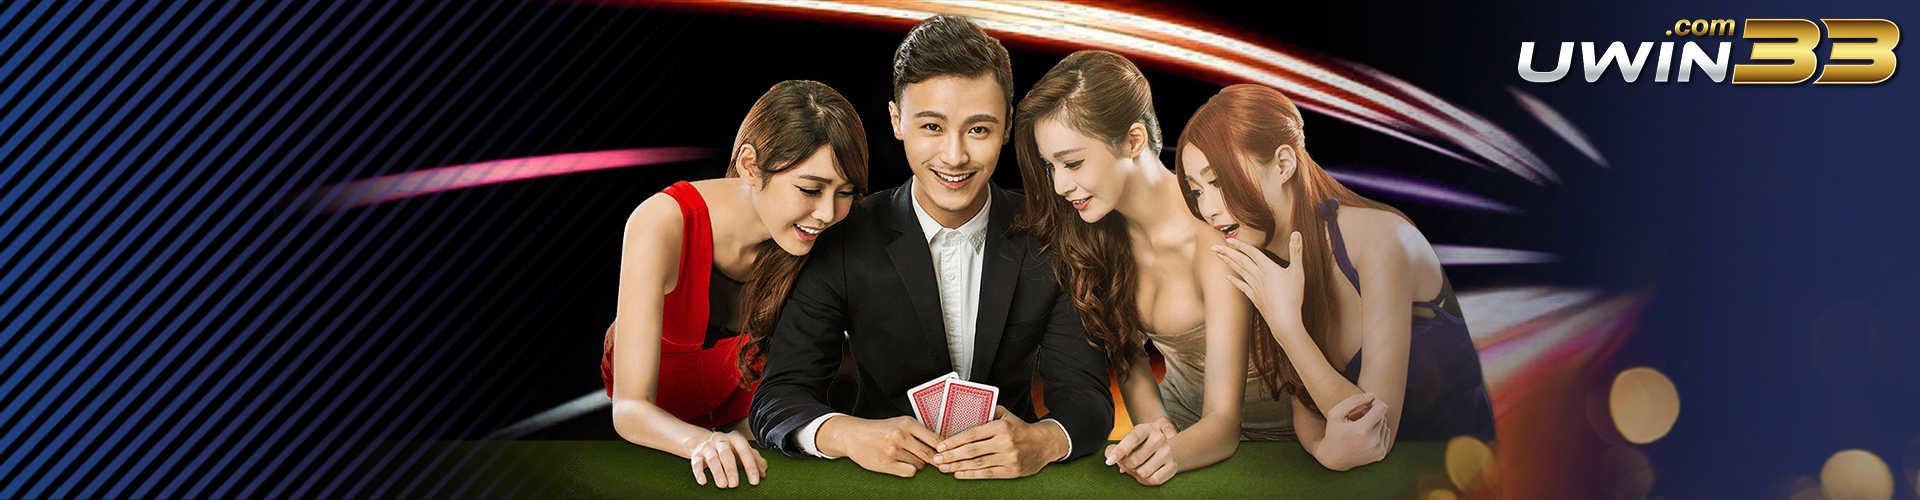 Secured Online Casino